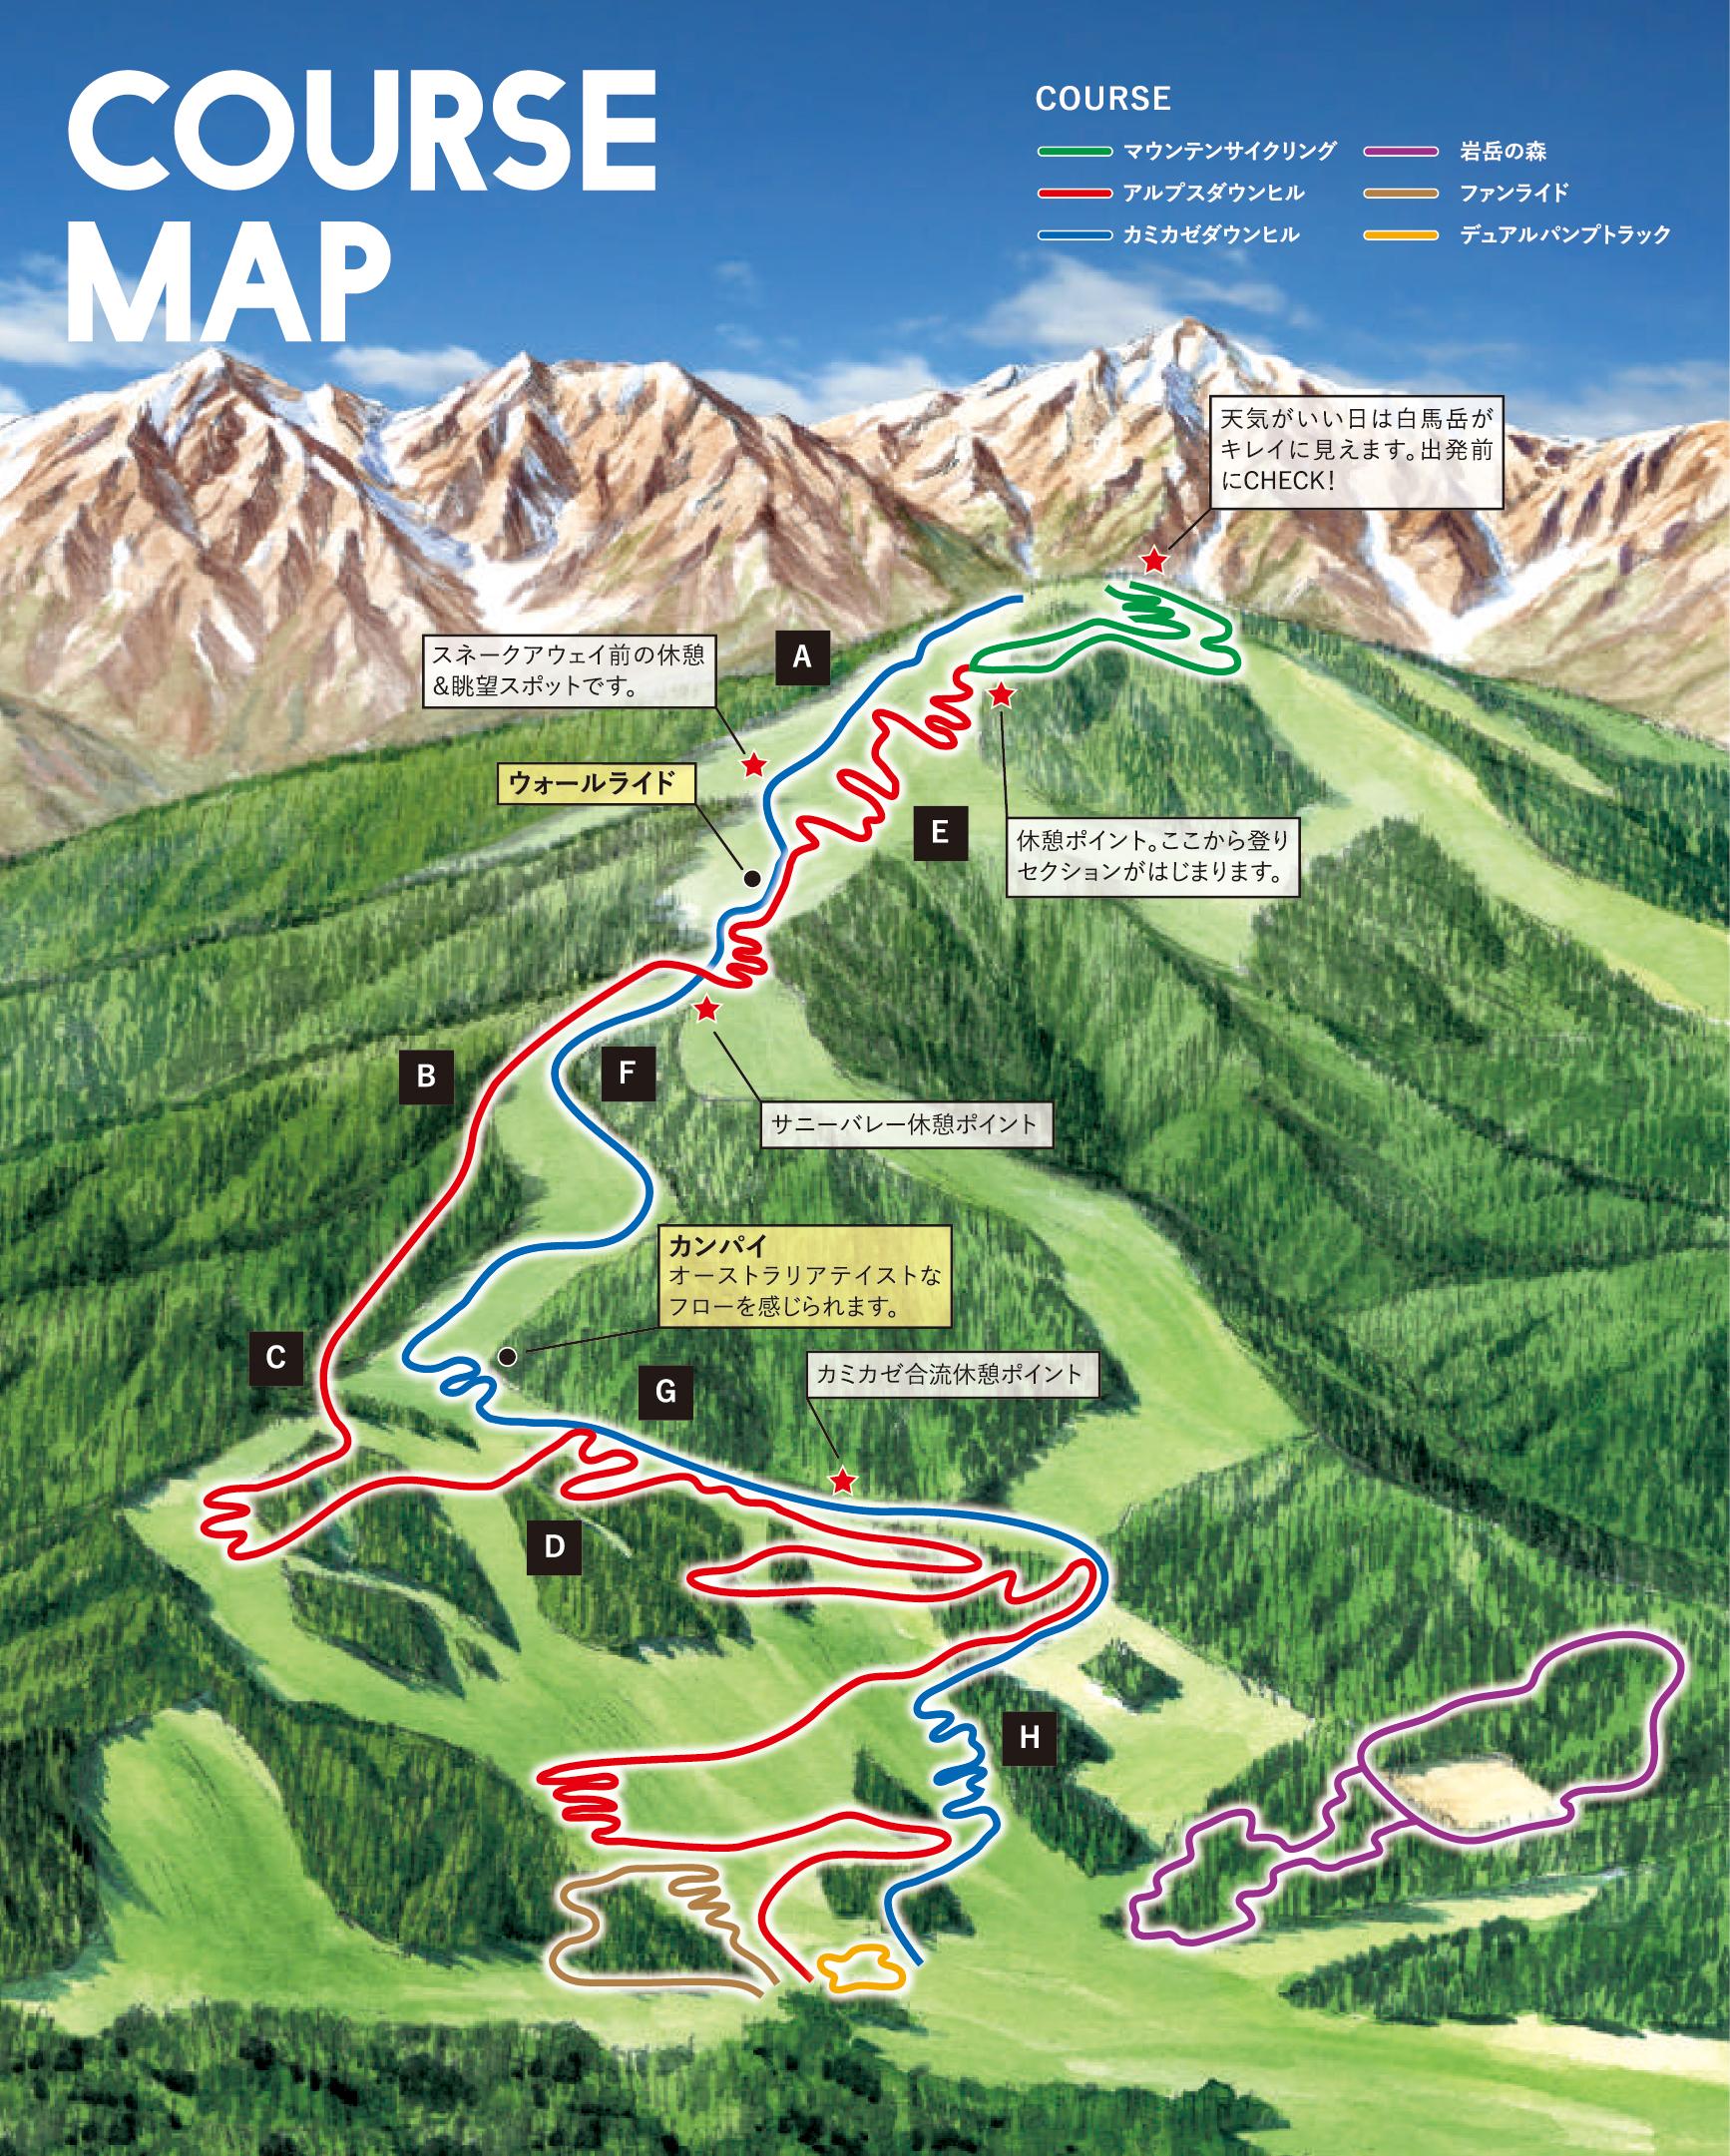 http://www.nsd-hakuba.jp/iwatake_mtb_park/img/course_map_1.jpg